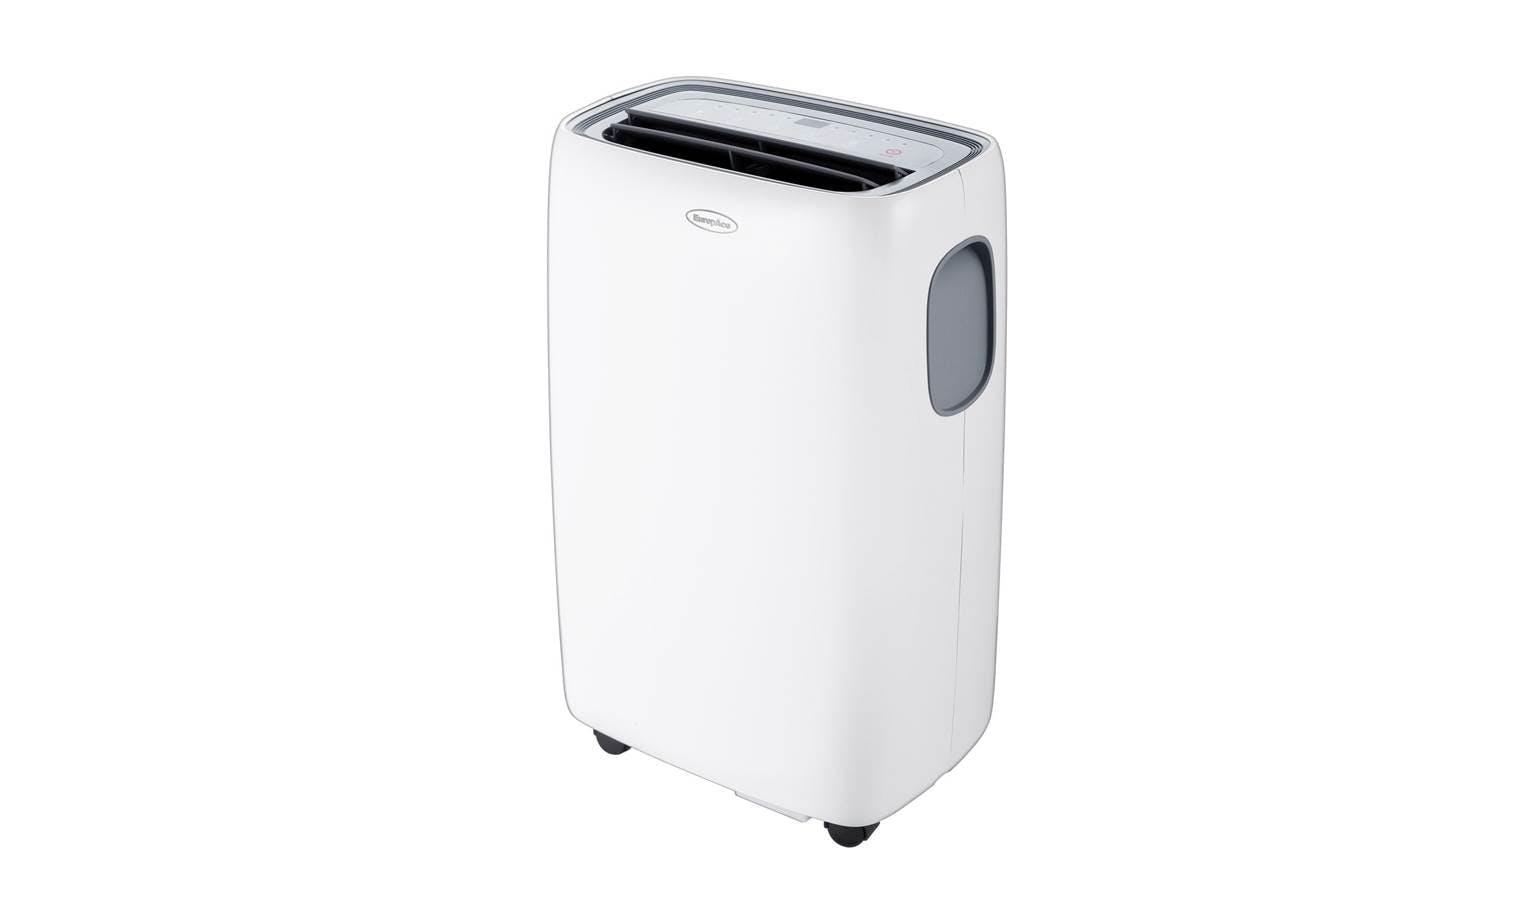 6a4a012800e EuropAce EPAC10T6 Portable Air Conditioner